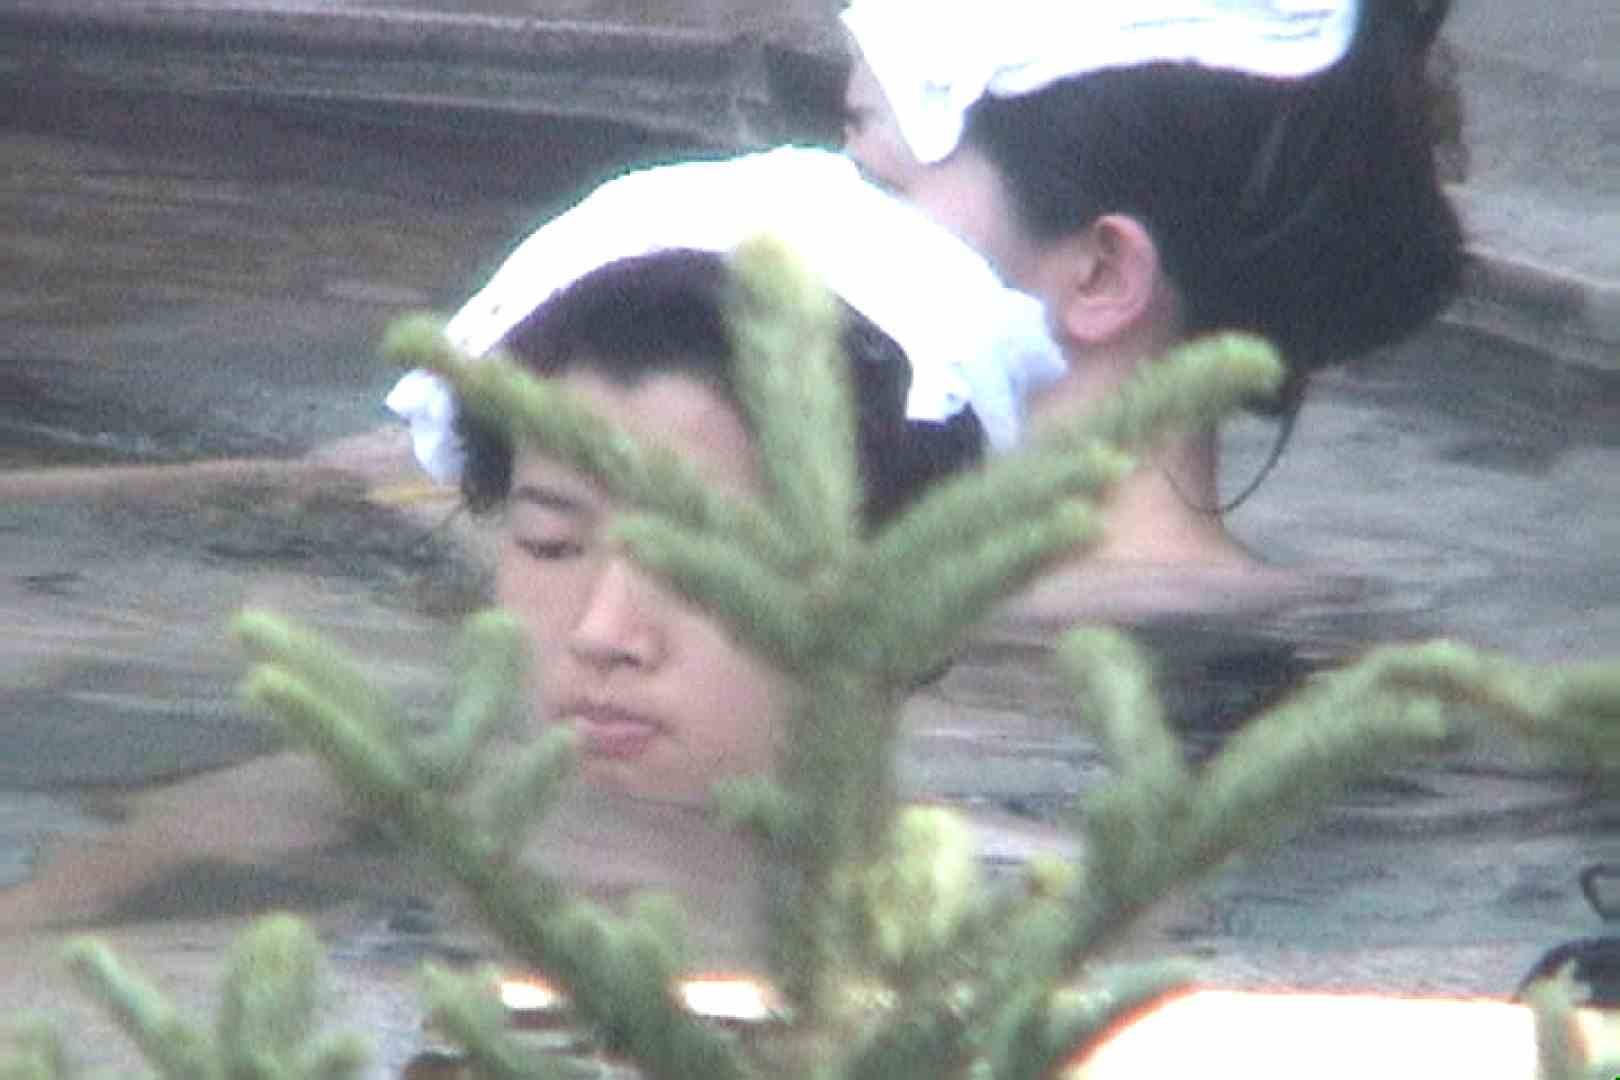 Aquaな露天風呂Vol.80【VIP限定】 露天風呂編   盗撮シリーズ  76PIX 41